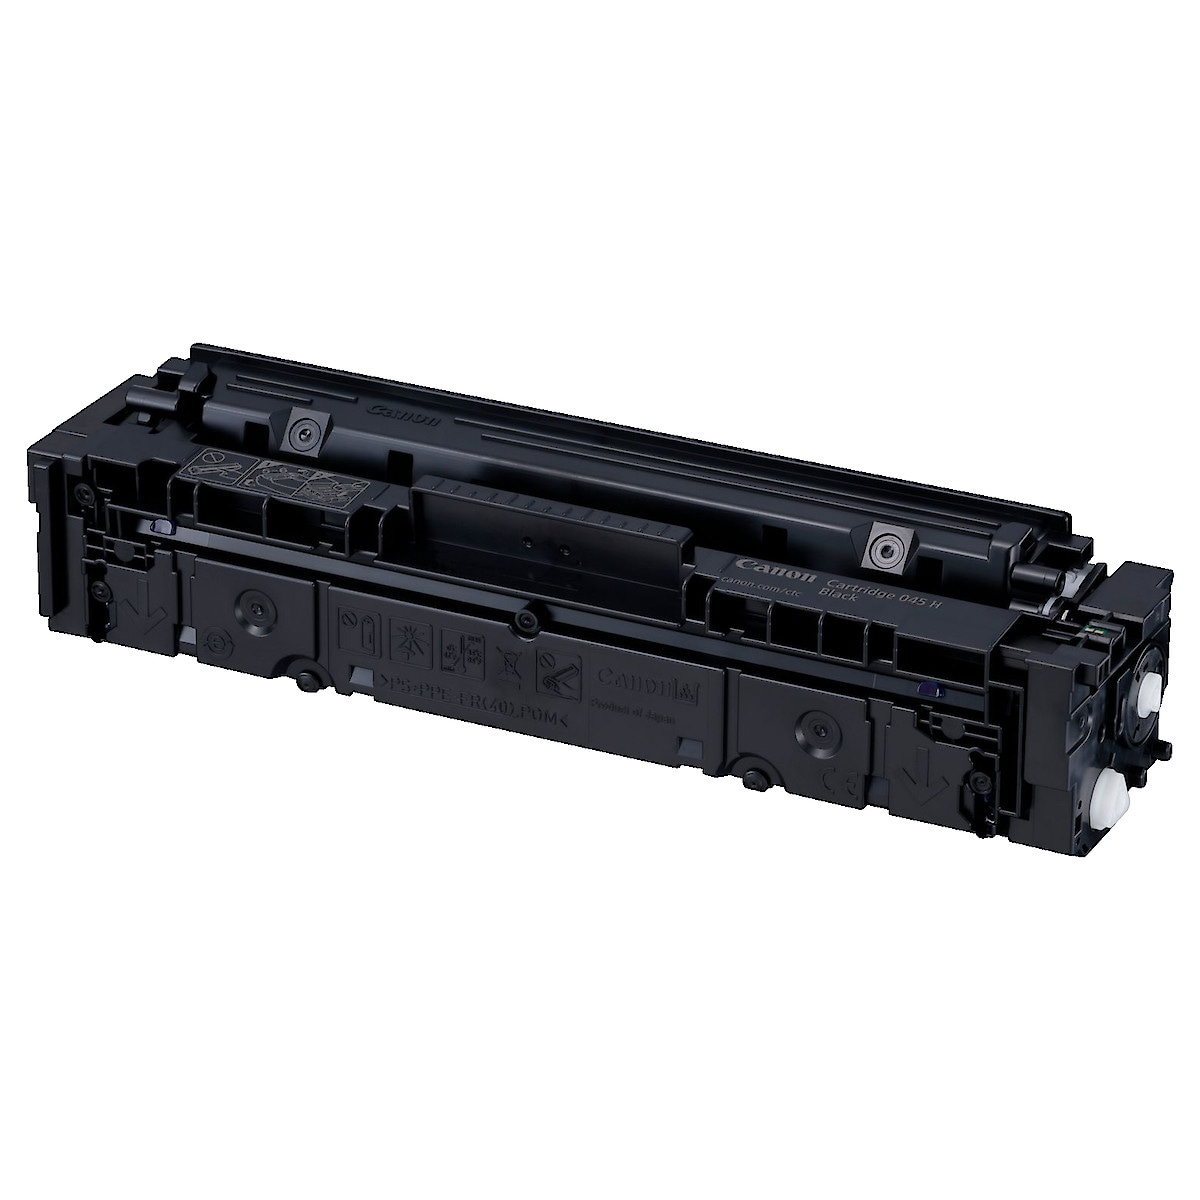 Canon CRG-045 Toner Cartridge